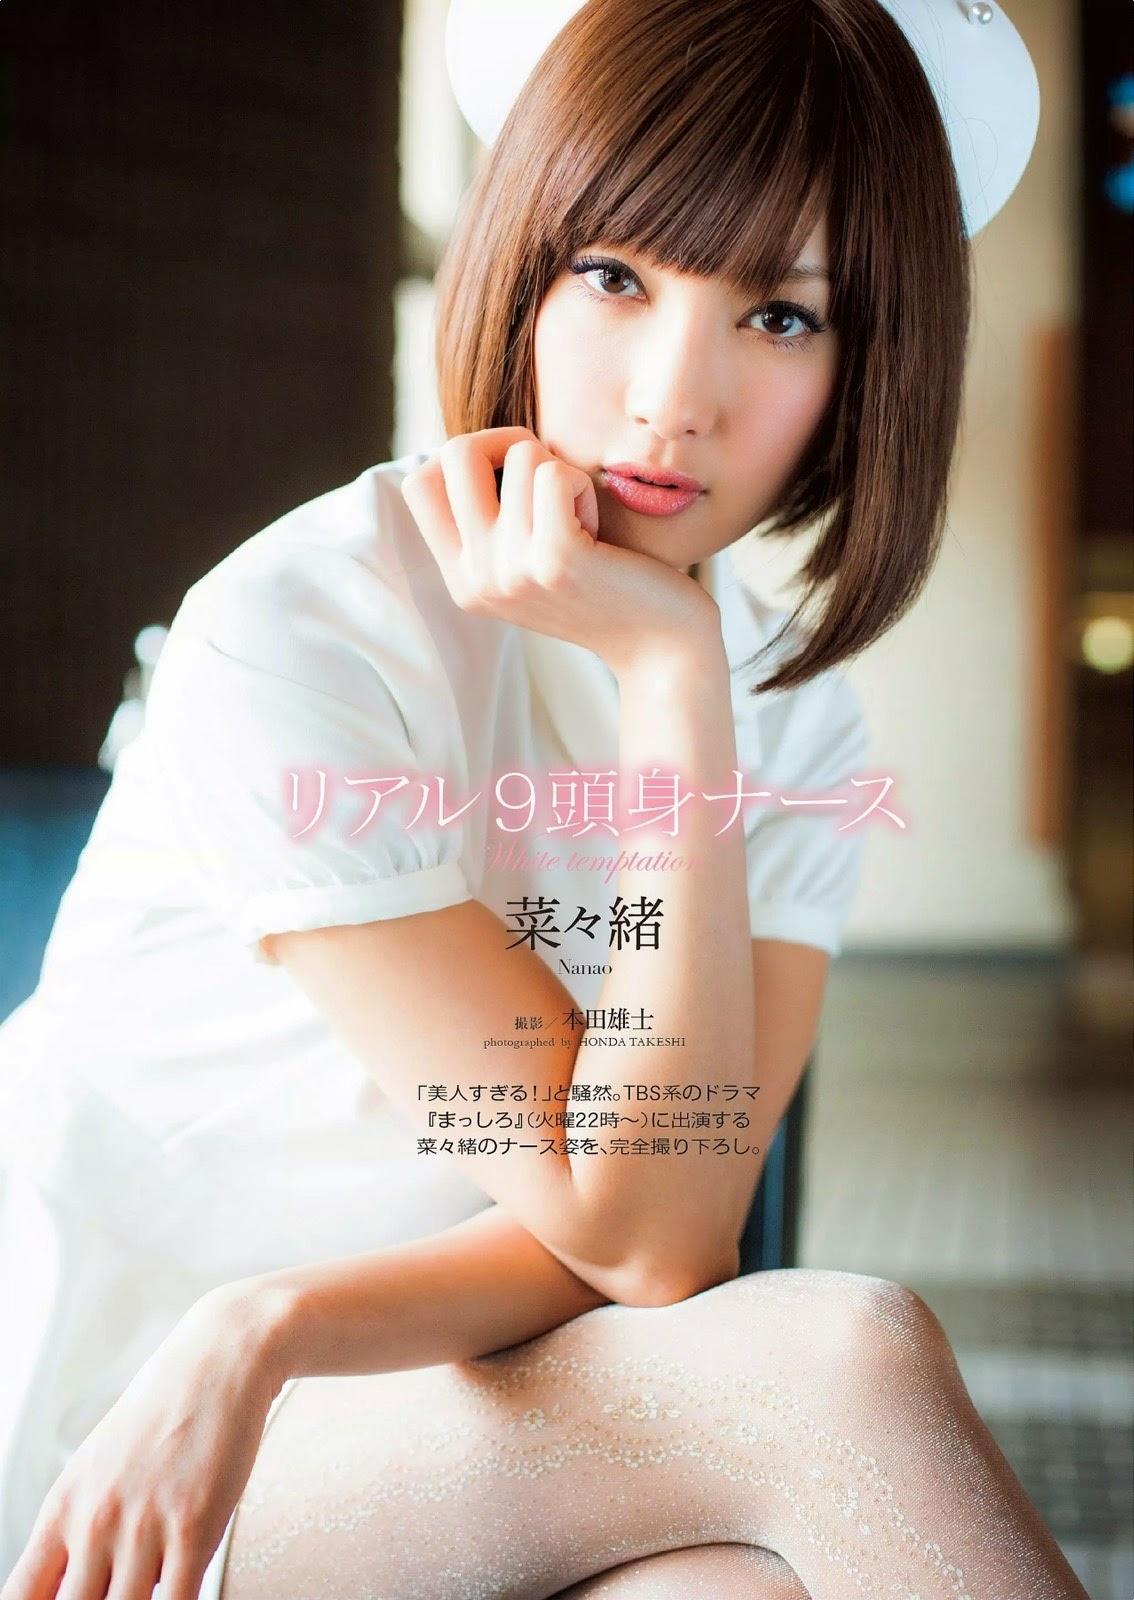 Nanao 菜々緒 White Temptation Images